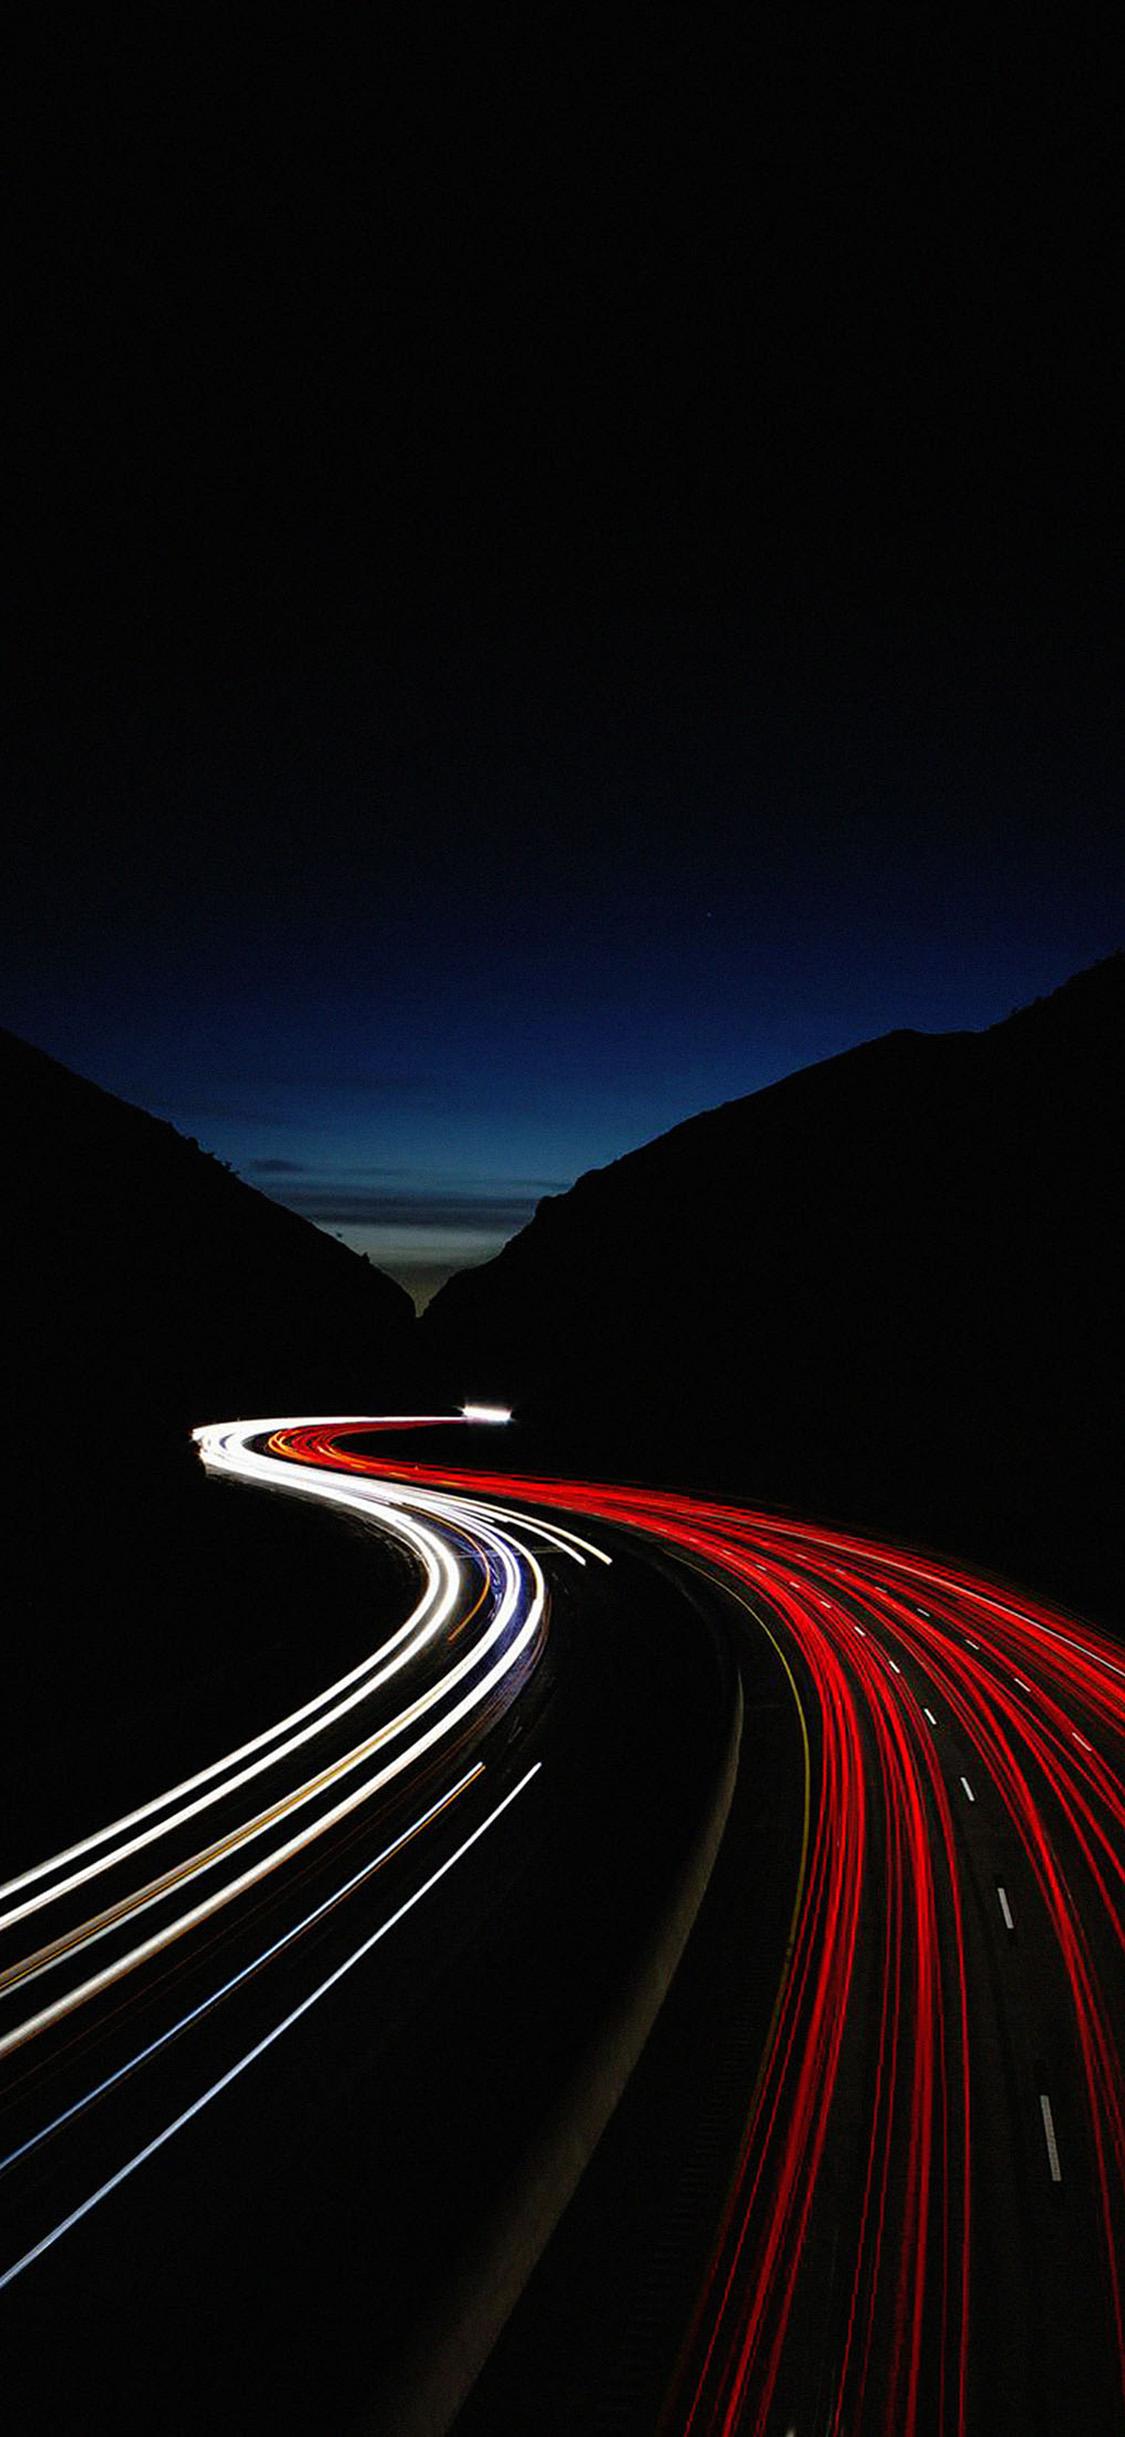 Download Street Car Lights Iphone X Wallpaper Hd Iphone X Wallpaper